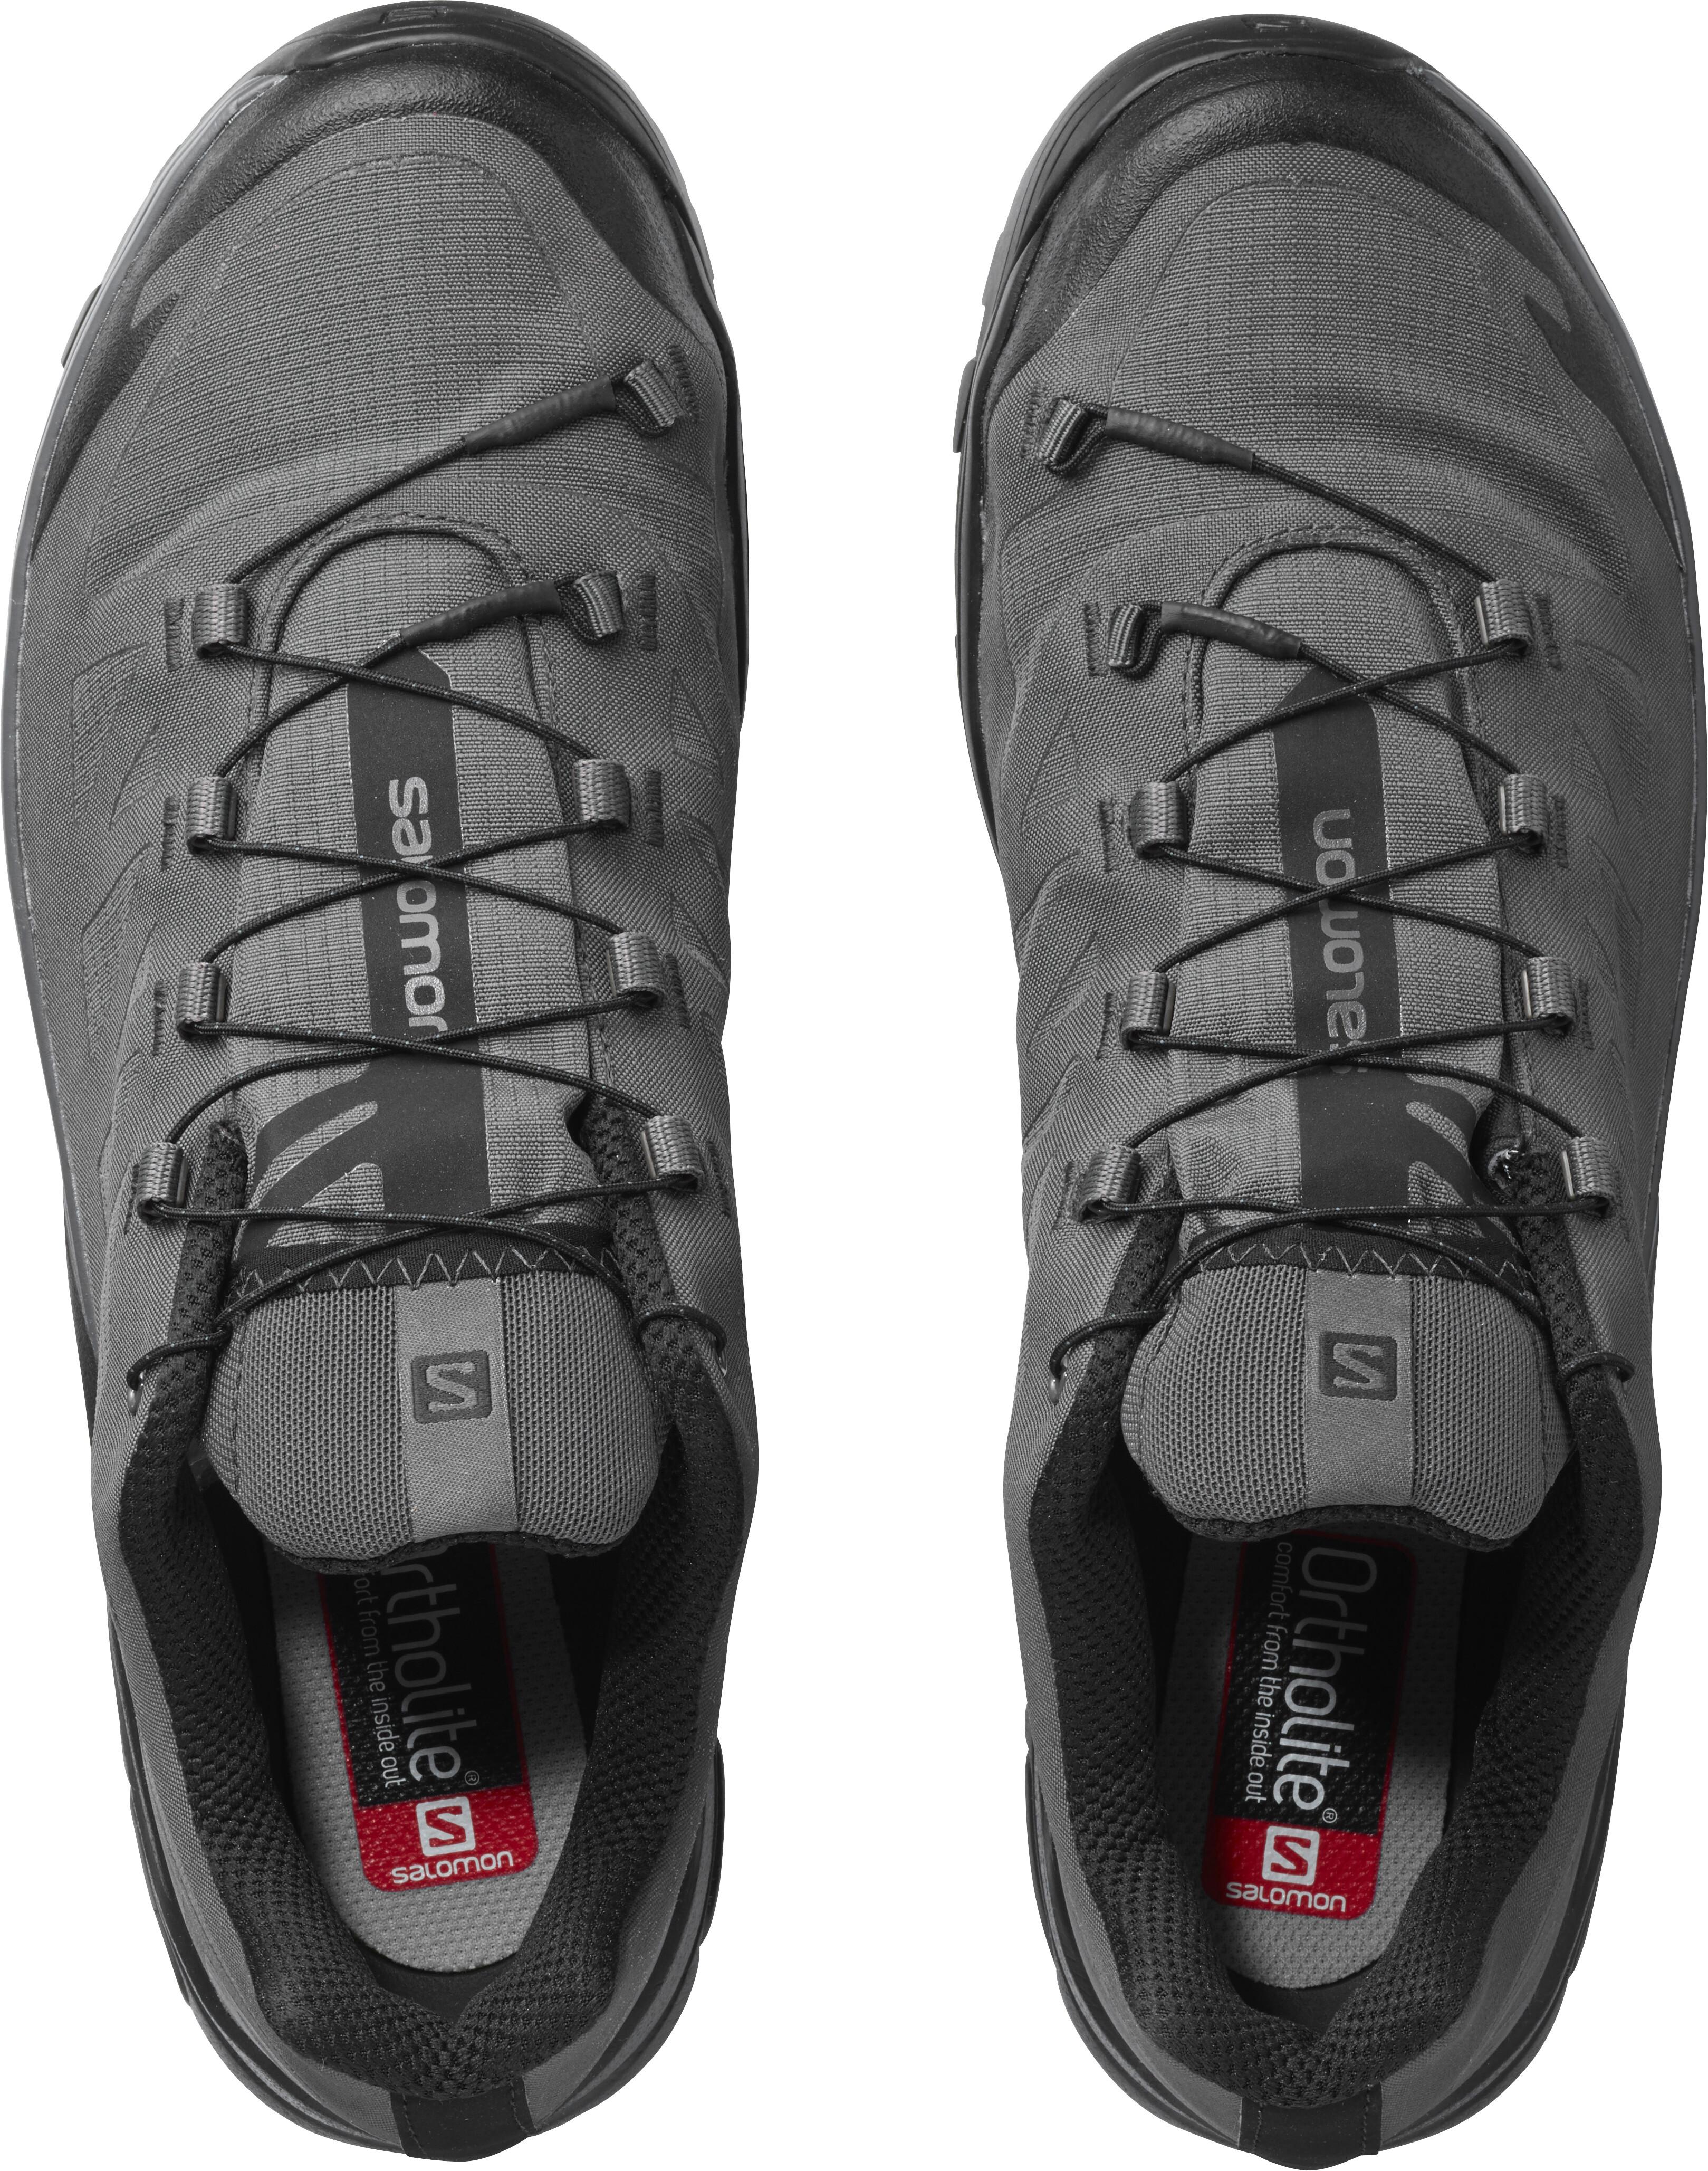 4edb994296e87 Salomon Outpath GTX Shoes Men grey at Addnature.co.uk